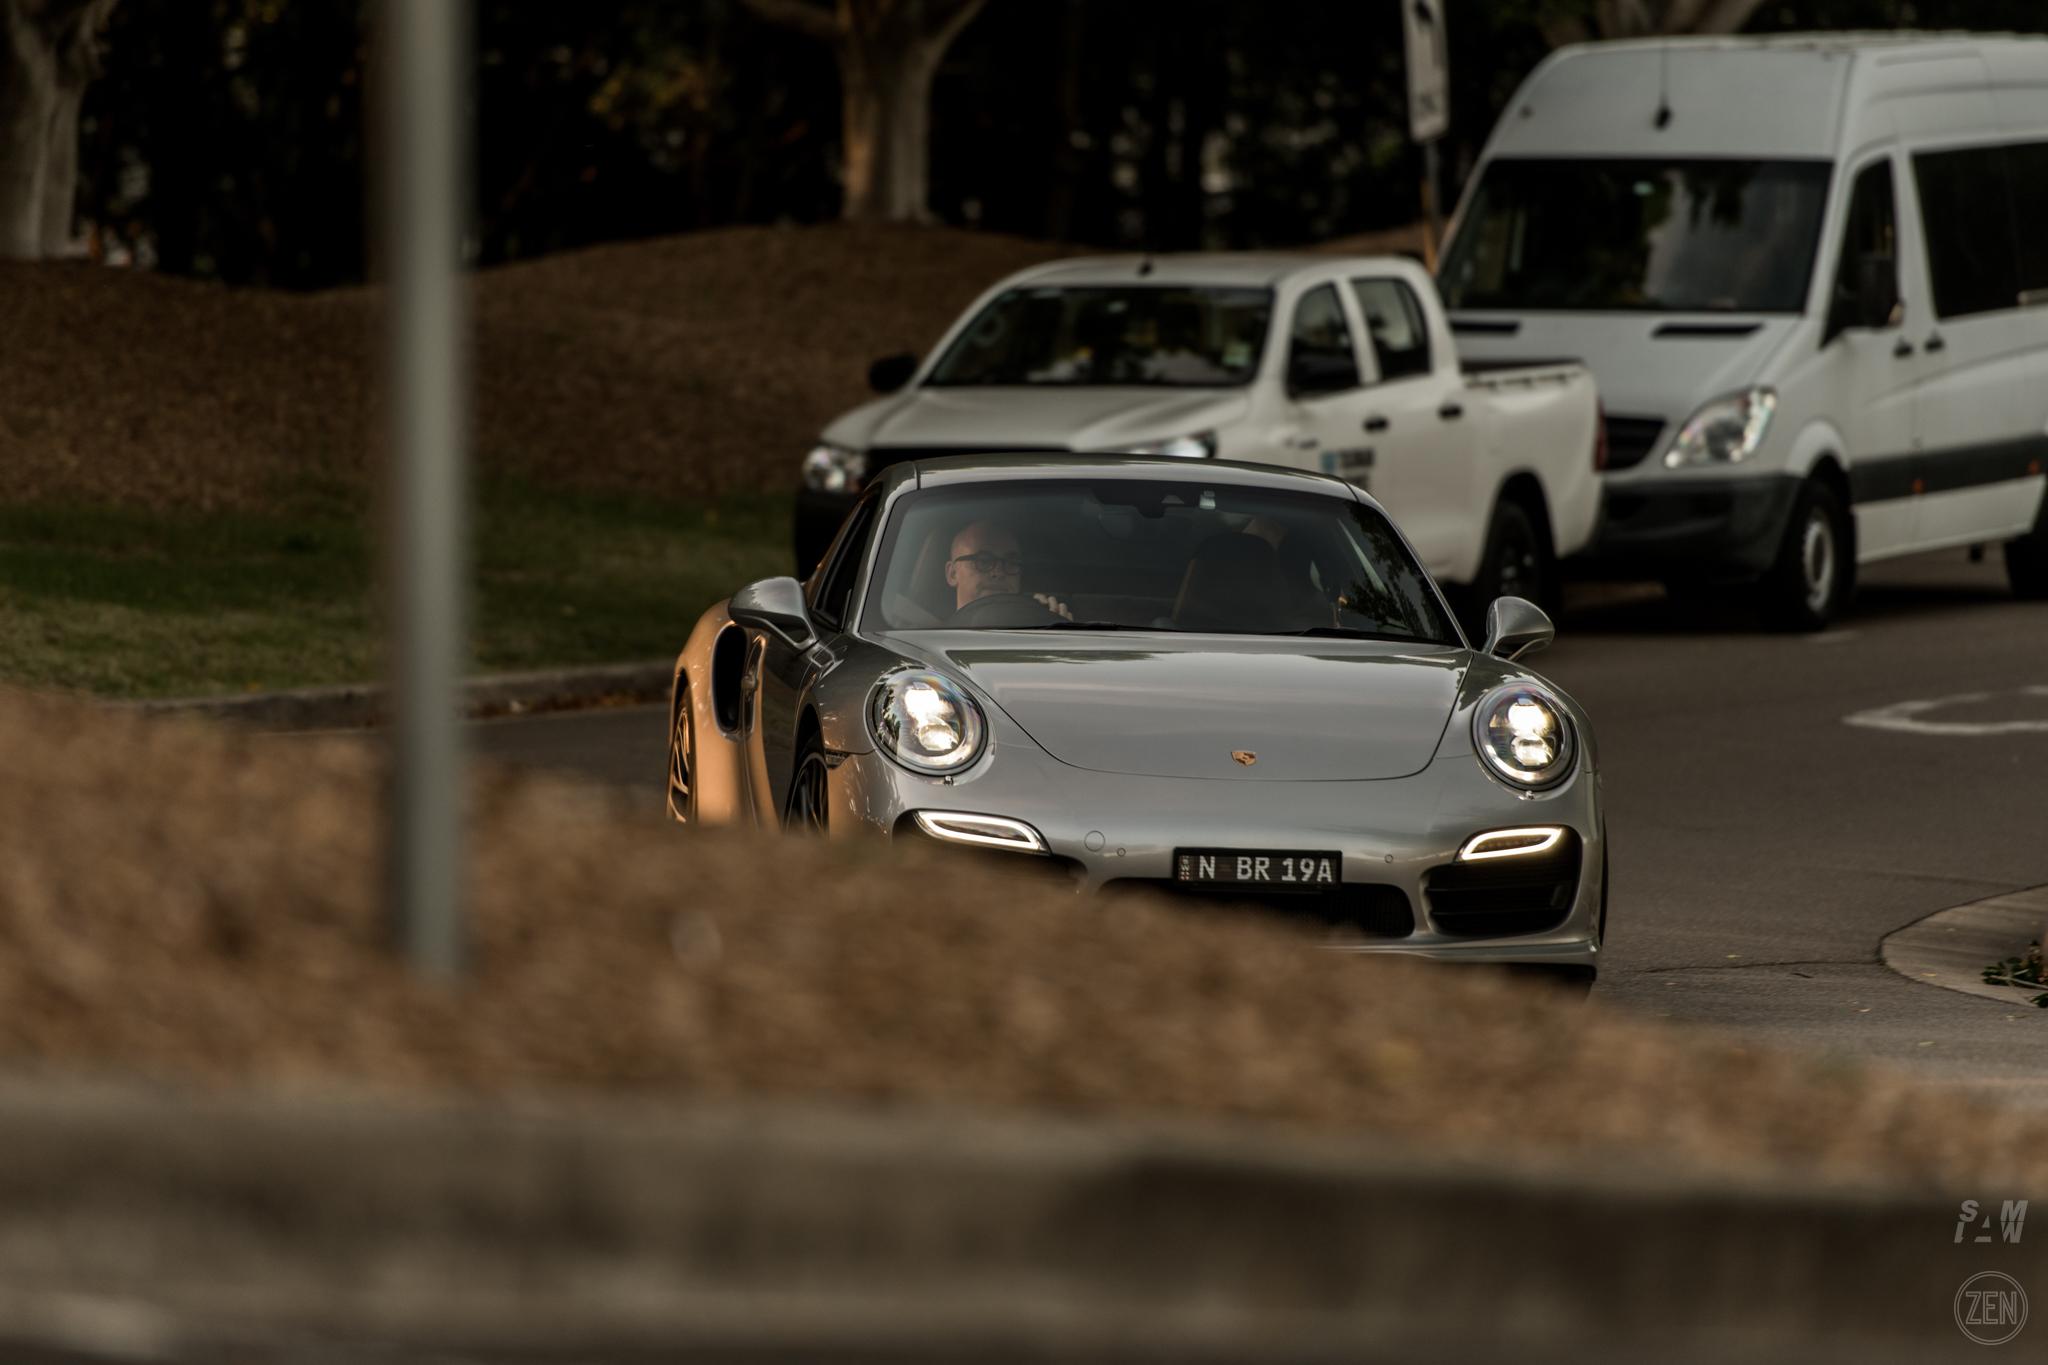 2019-10-27 - Autohaus Porsches & Coffee 015